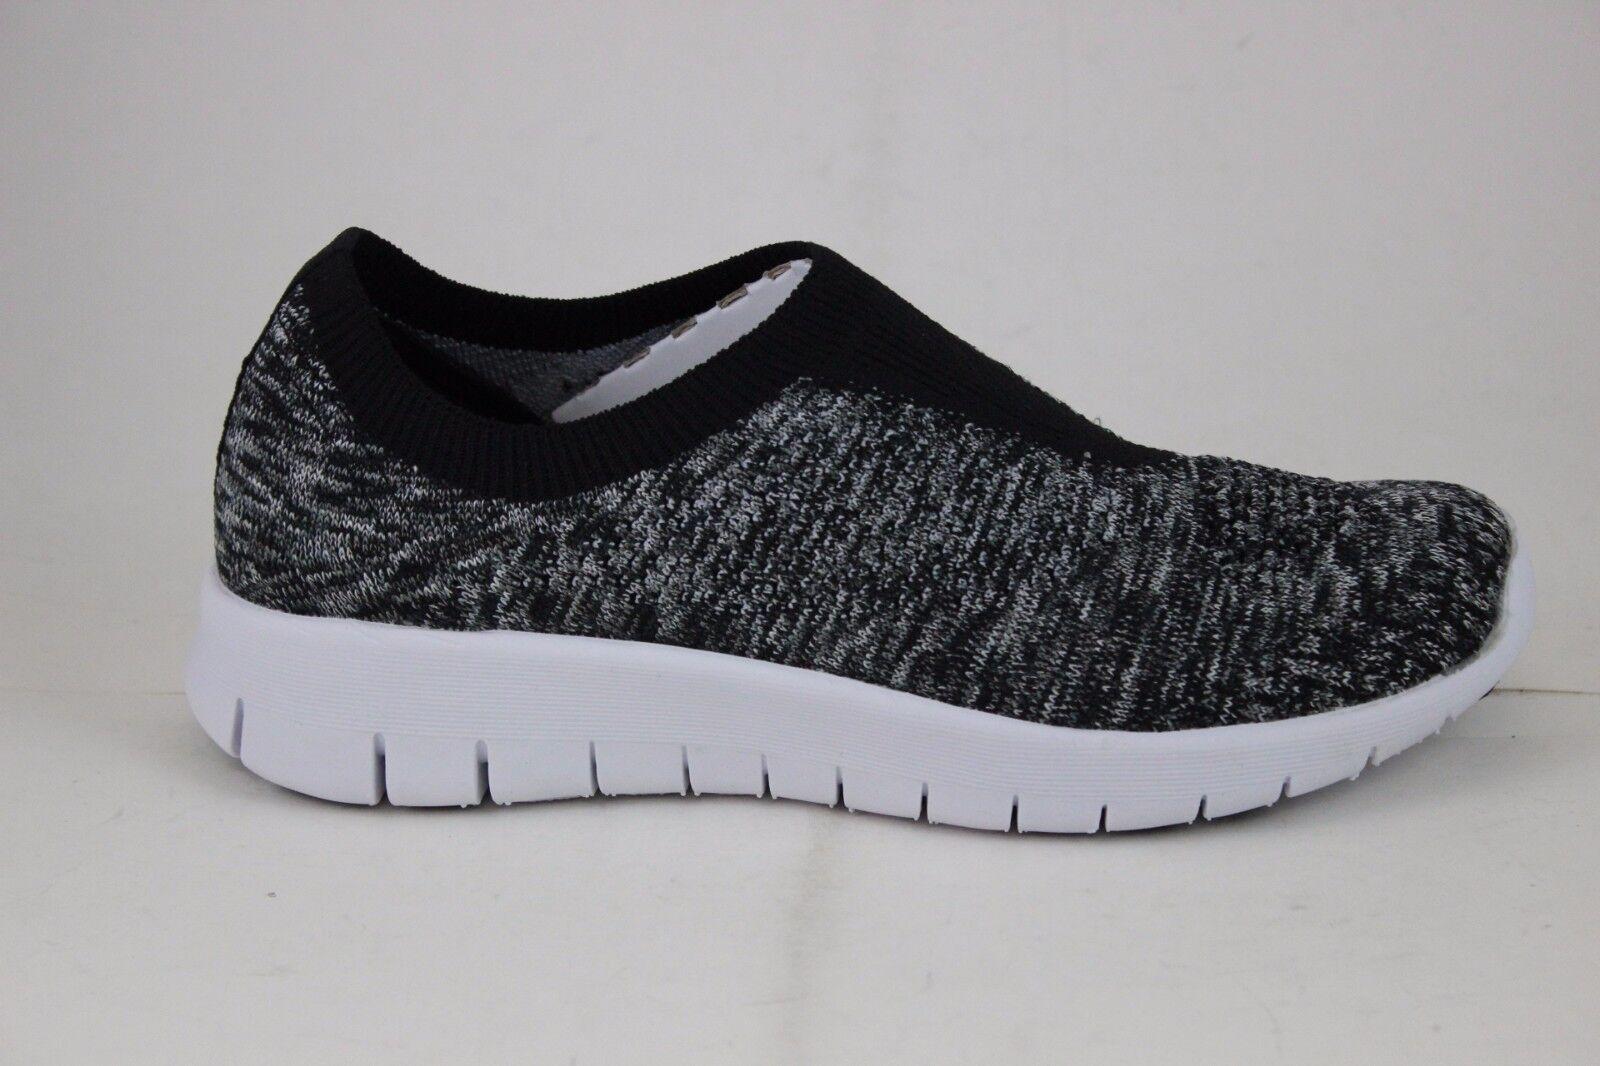 Skechers Mujer Brillante Idea Easy Going Negro blancoo 22995   Bkw Nuevo